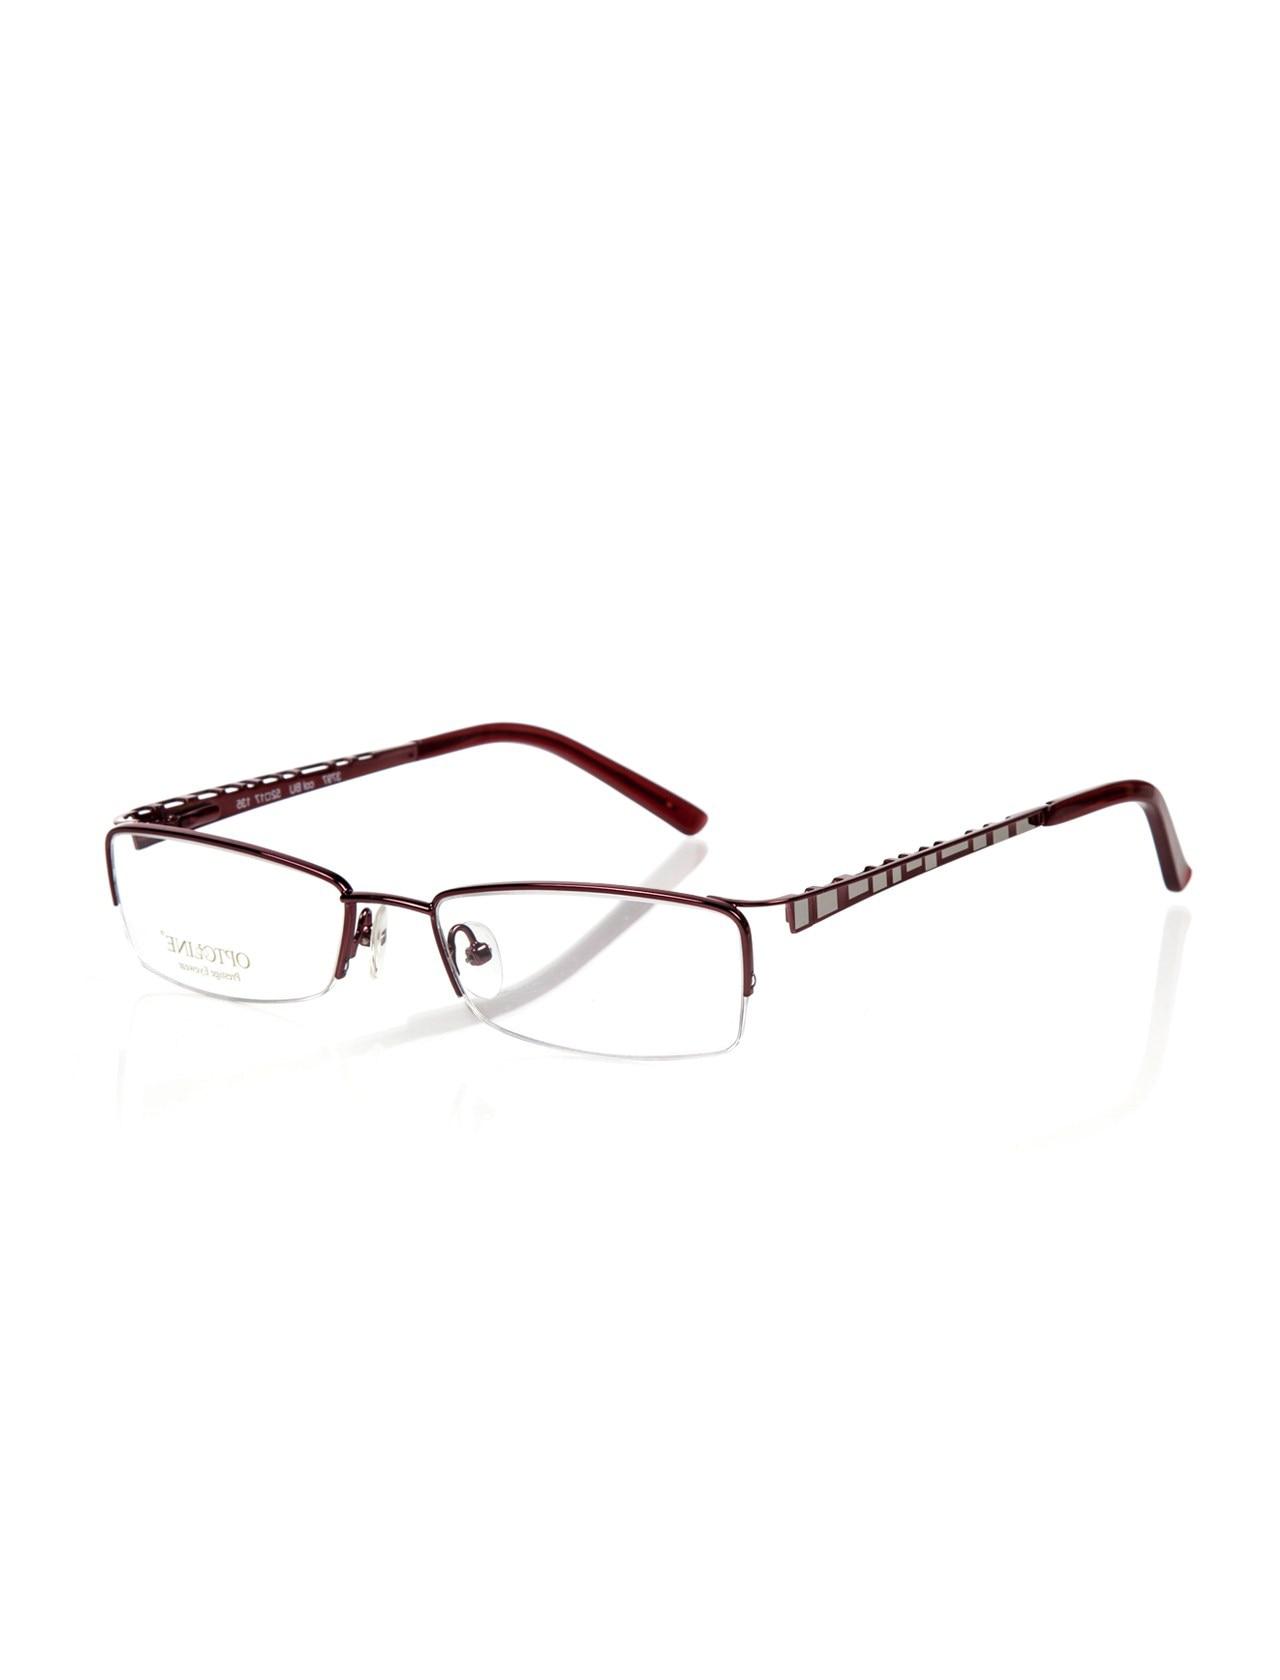 Markamilla Women Reading Glasses Frame Demo Glasses Eyewear Transparent High Quality WomenOptoline F-S 3797 THIS